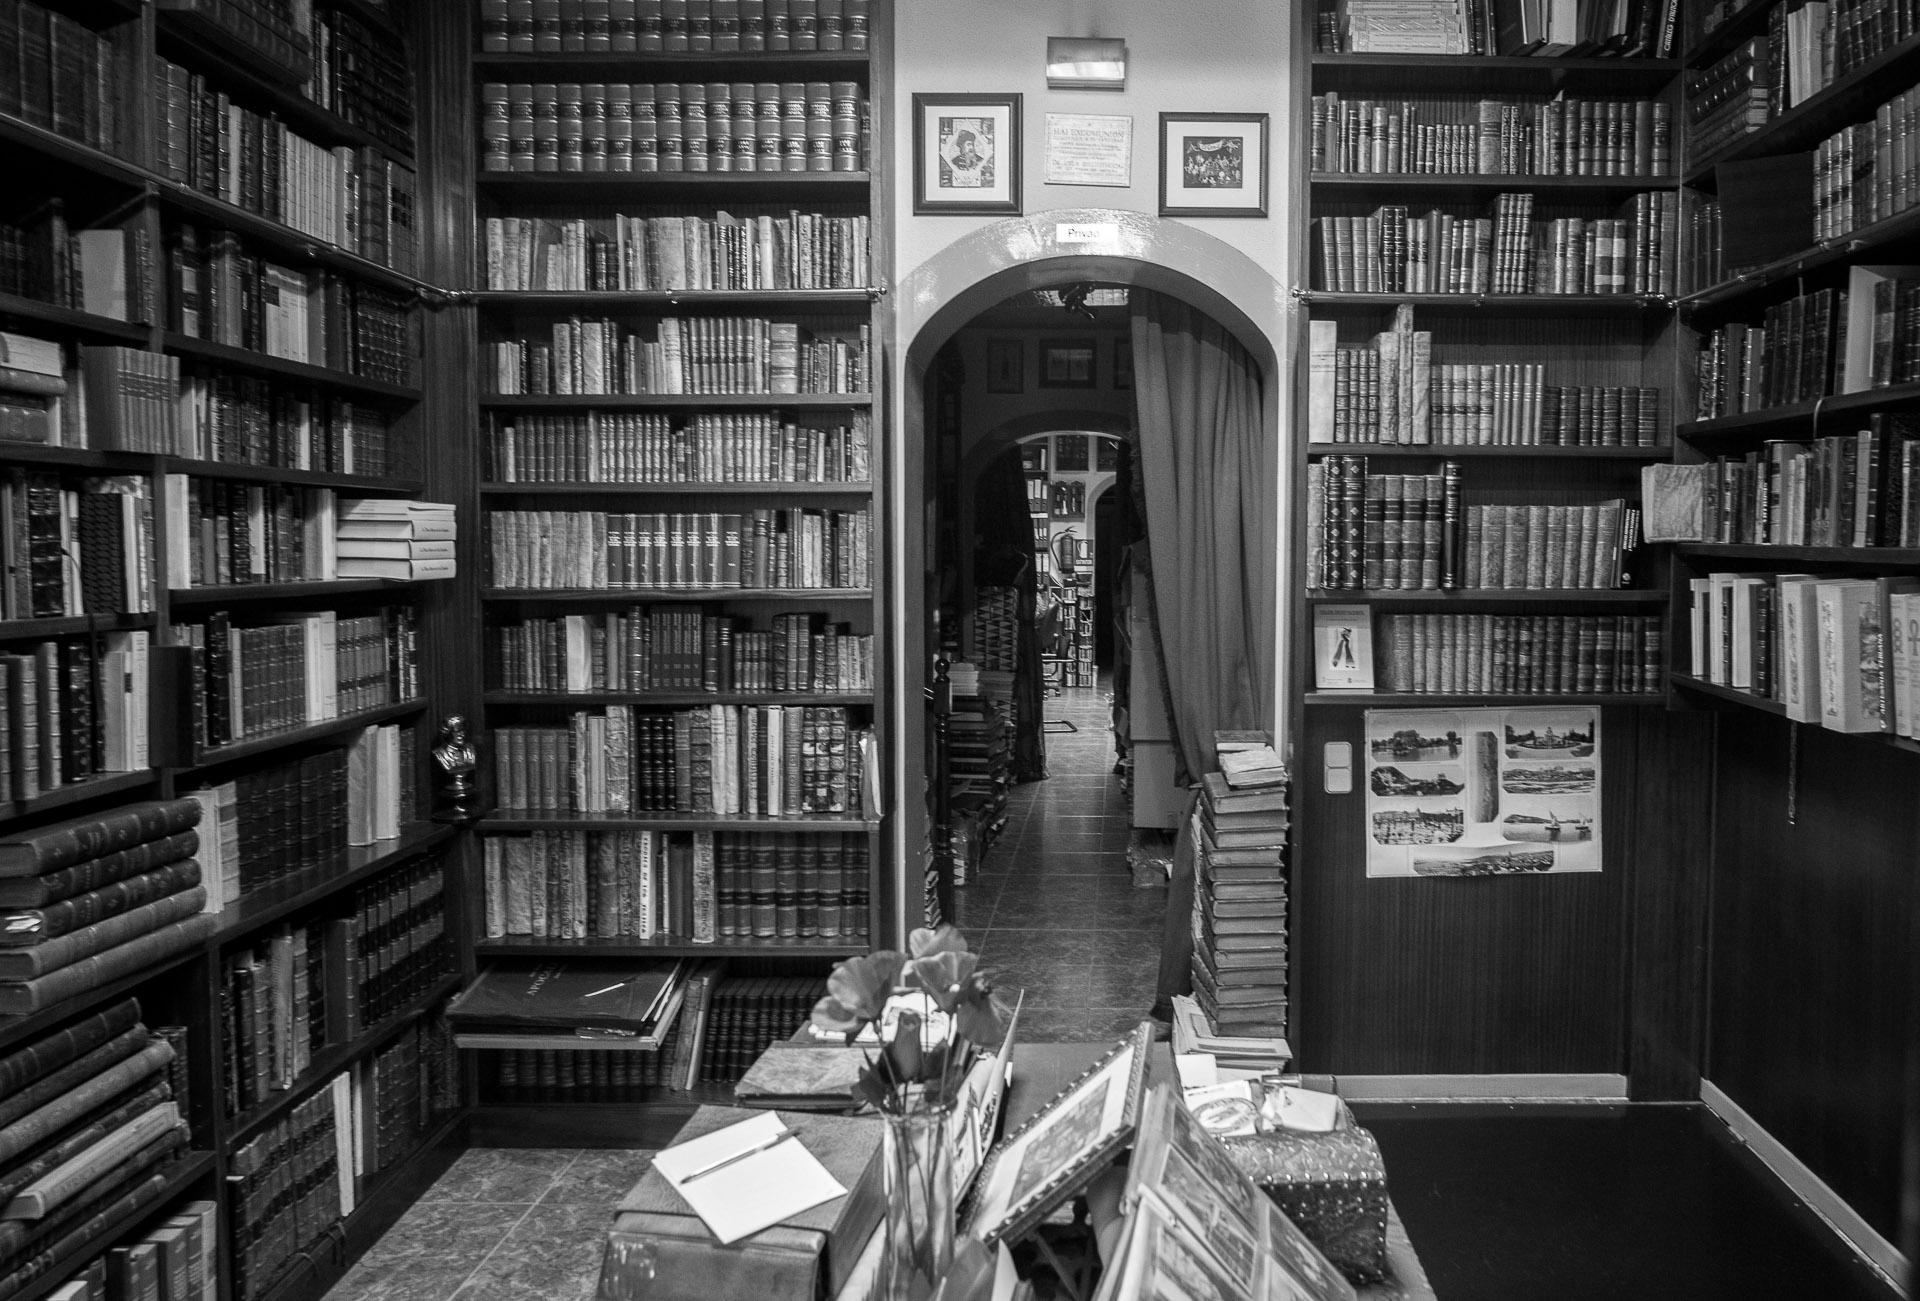 librerias-madrid-librosmadrid03.jpg